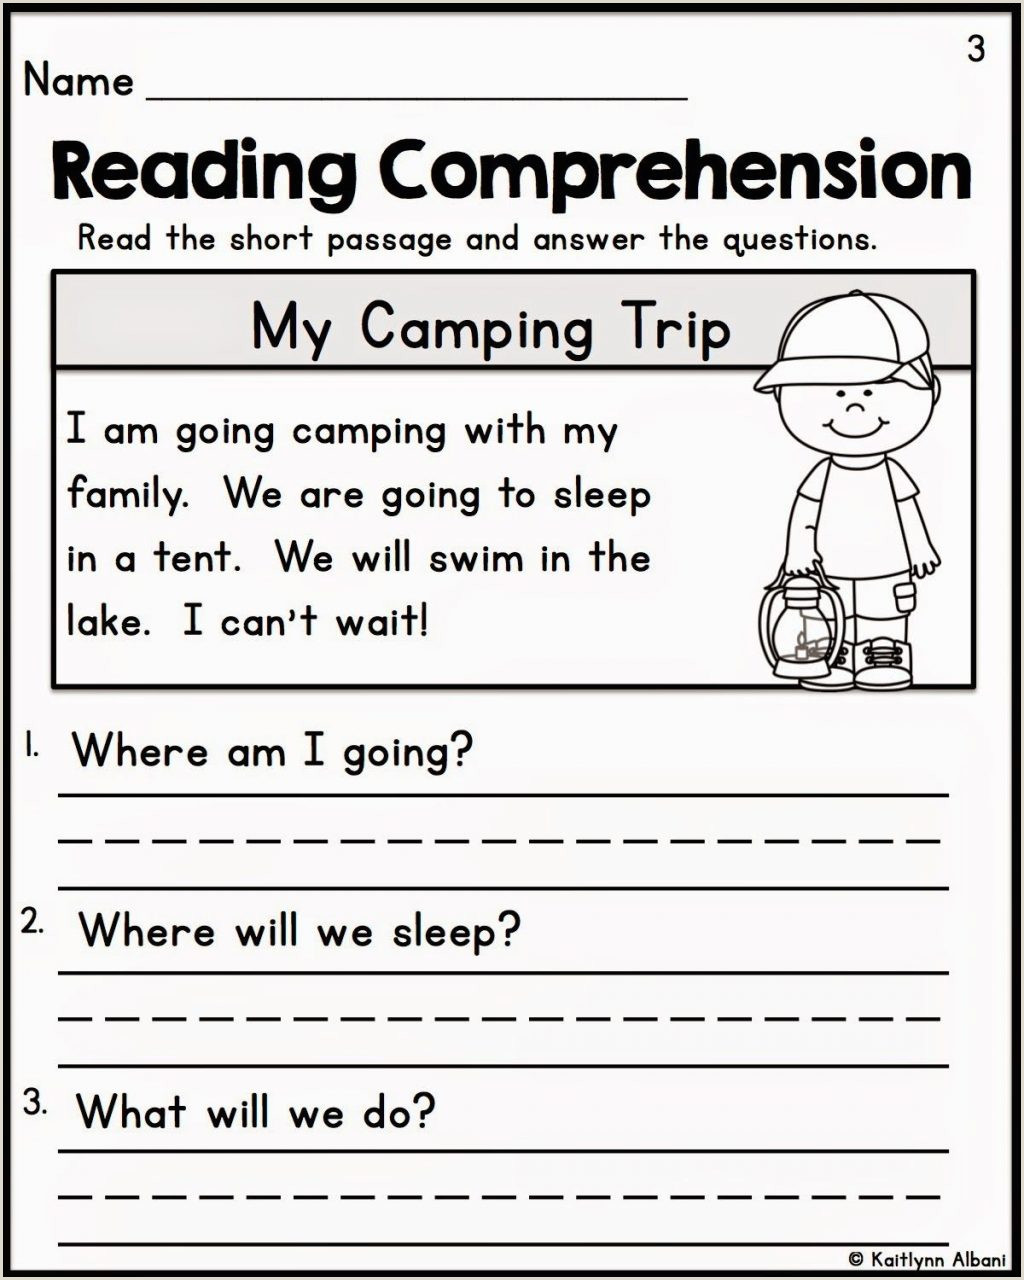 Kindergarten Reading Comprehension Workbook Pdf